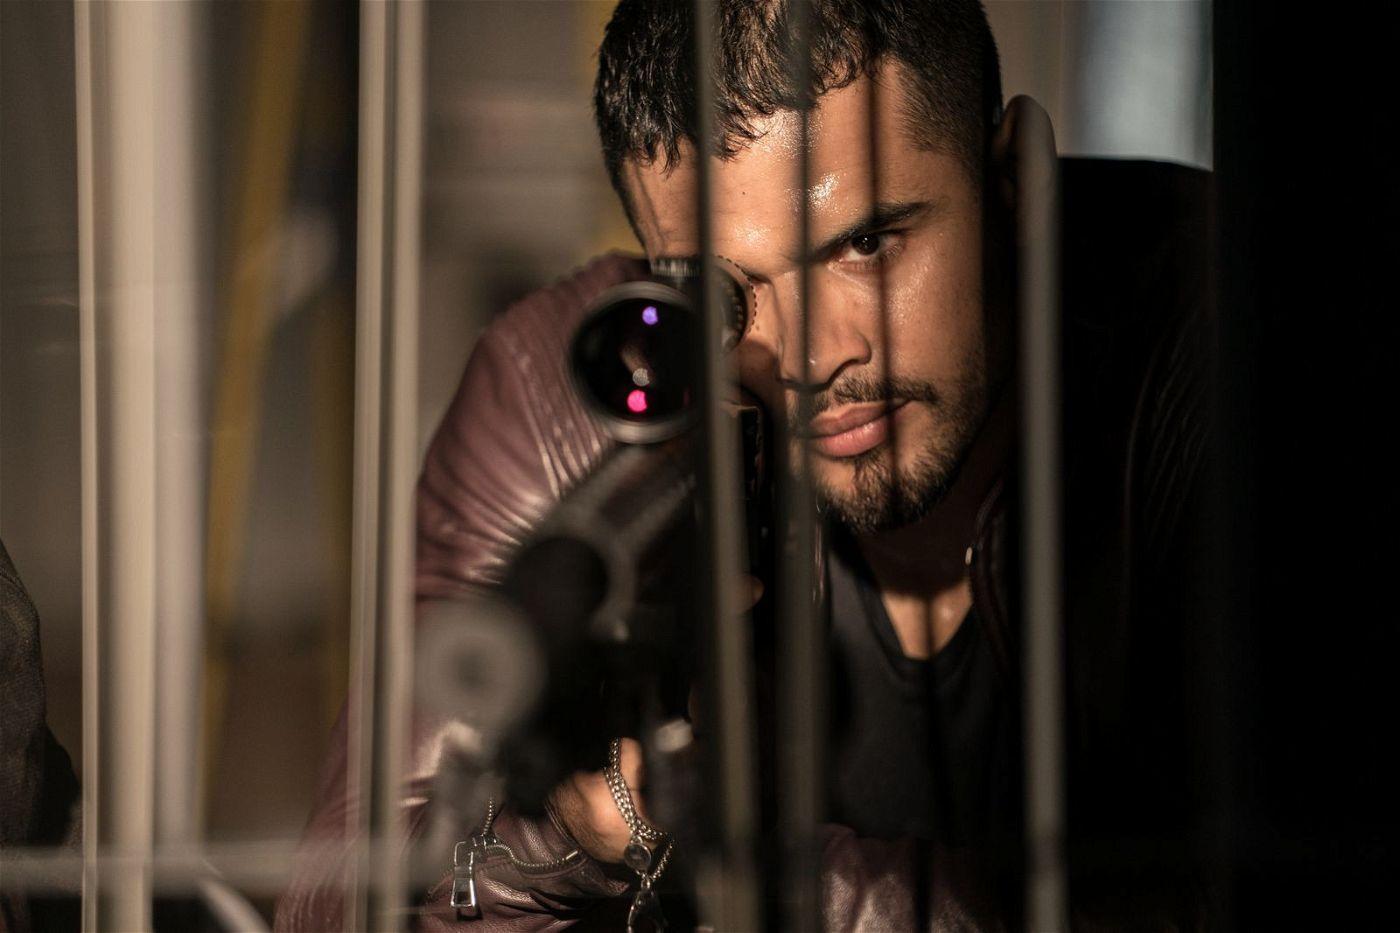 Der Bösewicht Armando Armas (Jacob Scipio) hat sein Ziel genau im Visier.